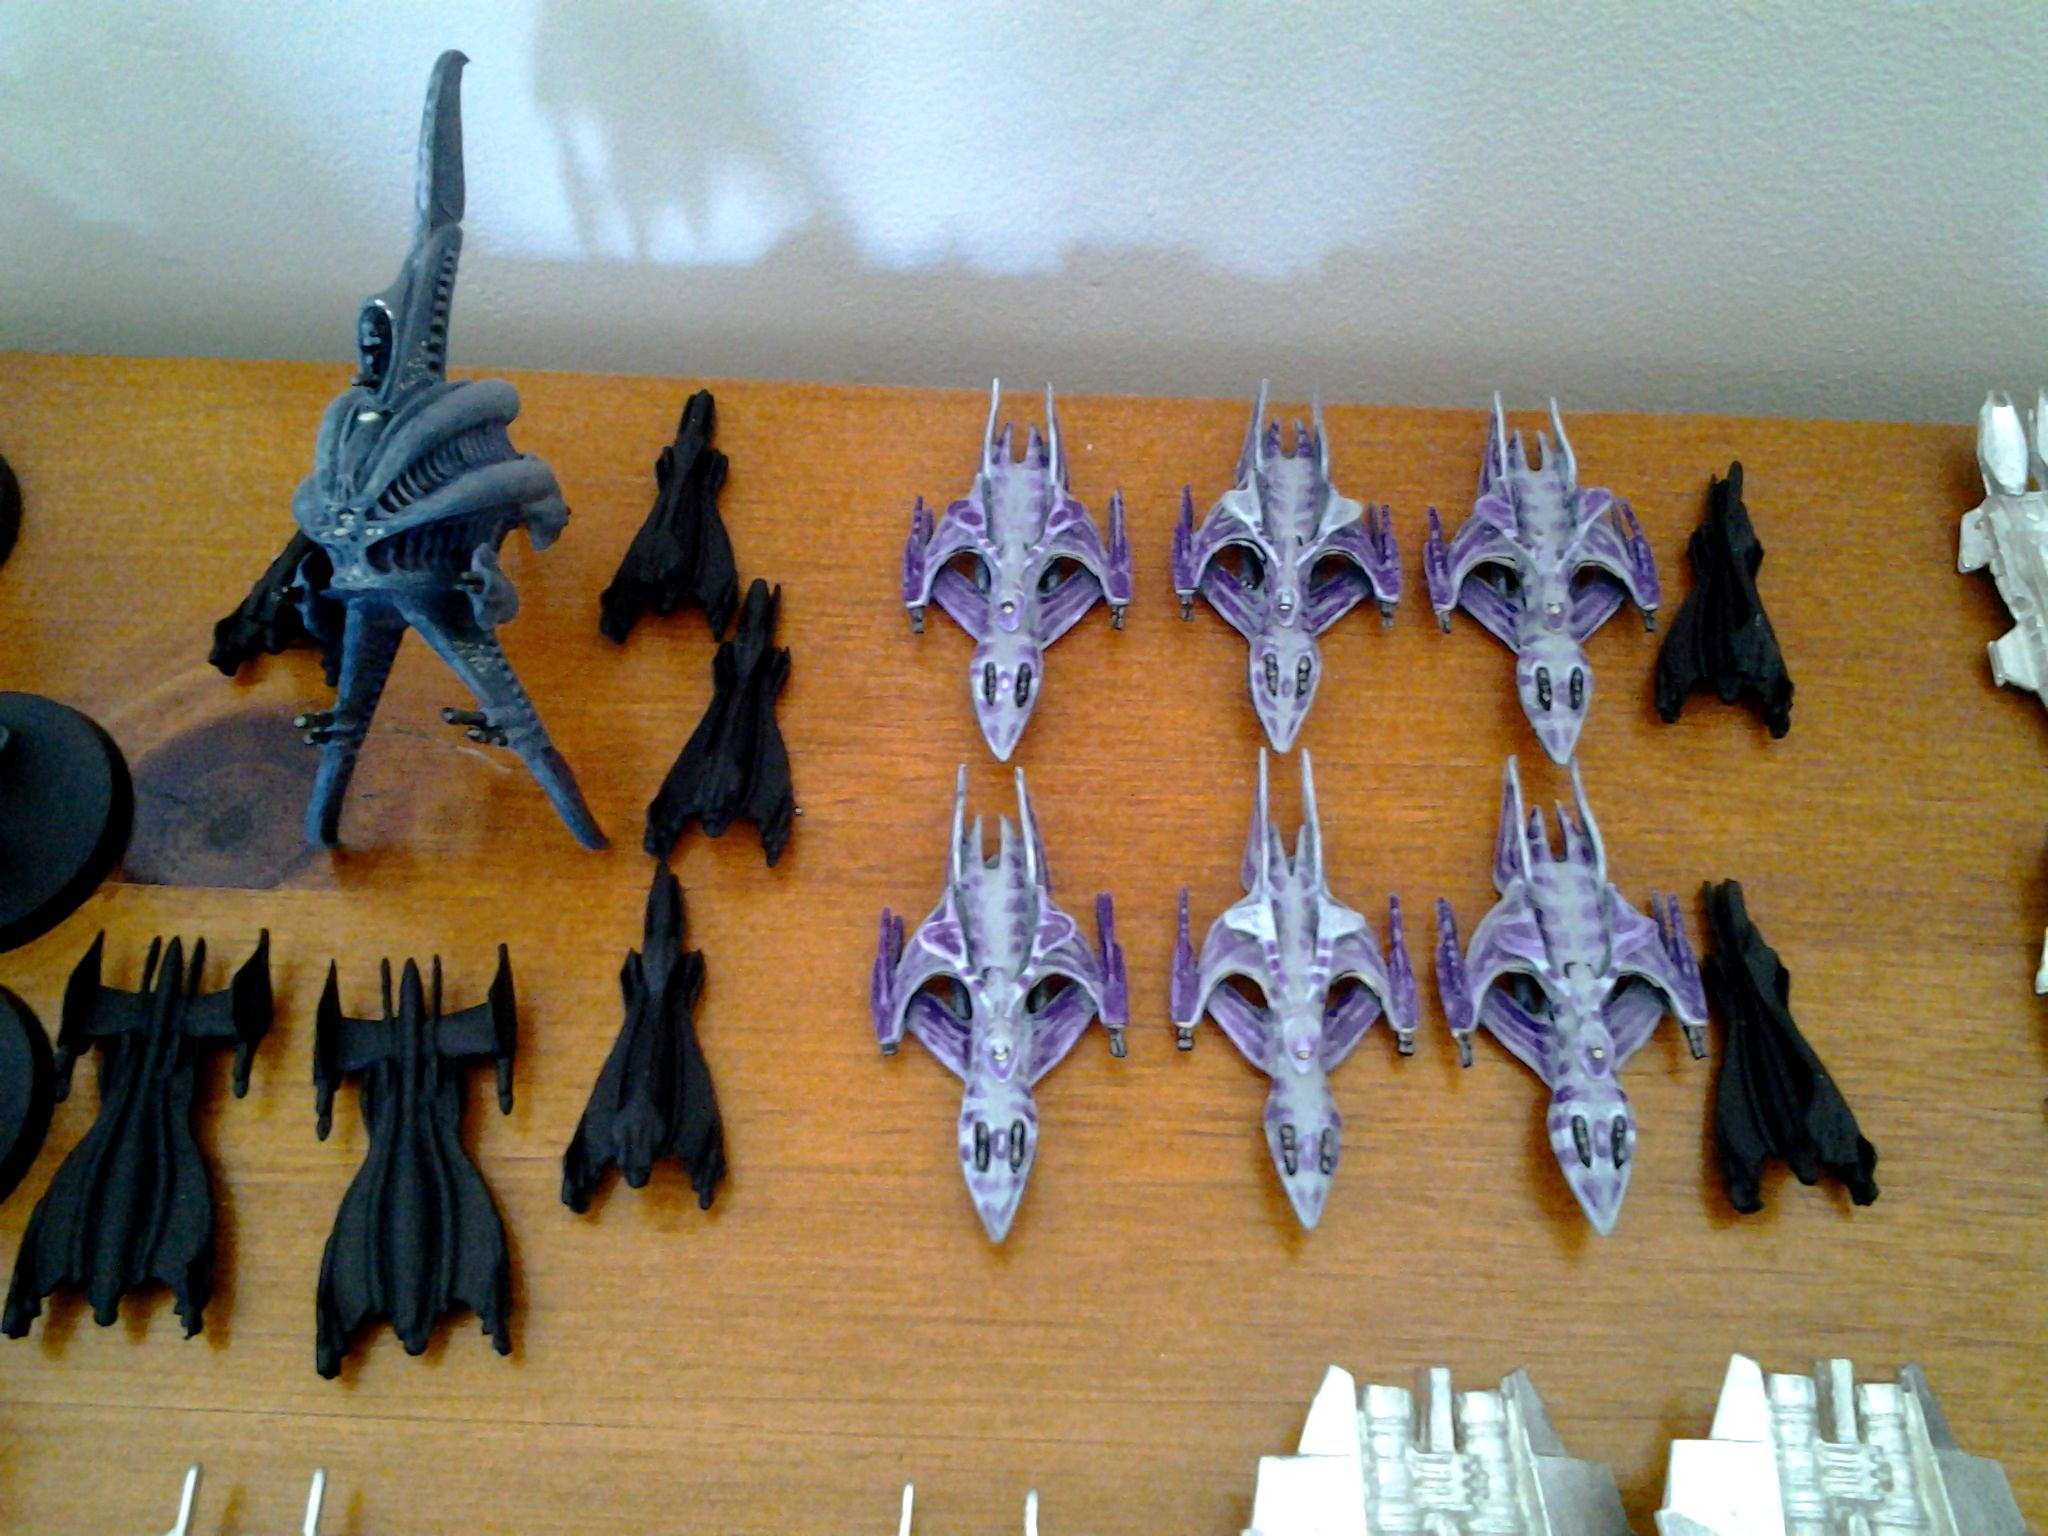 A Call To Arms, Babylon 5, Isa, Whitestar Fleet